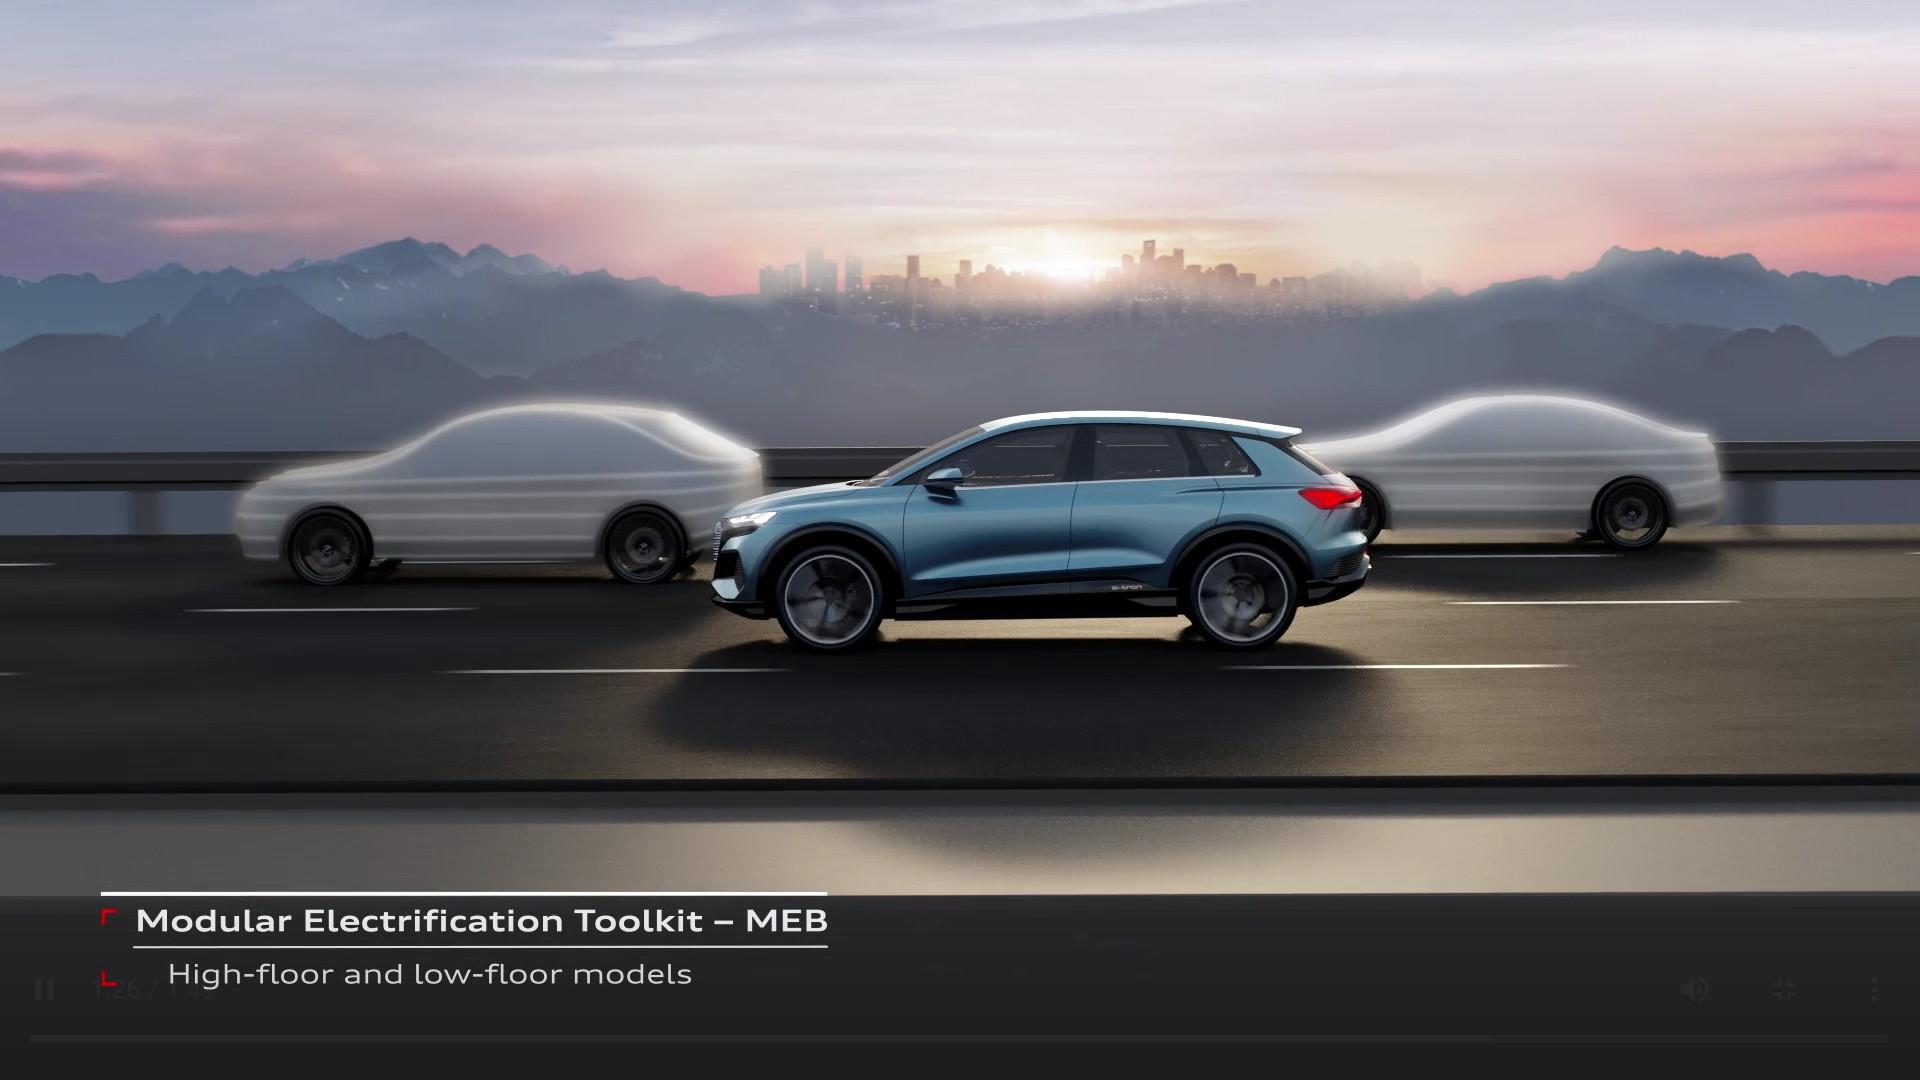 Audi teases future MEB models next to Q4 E-tron